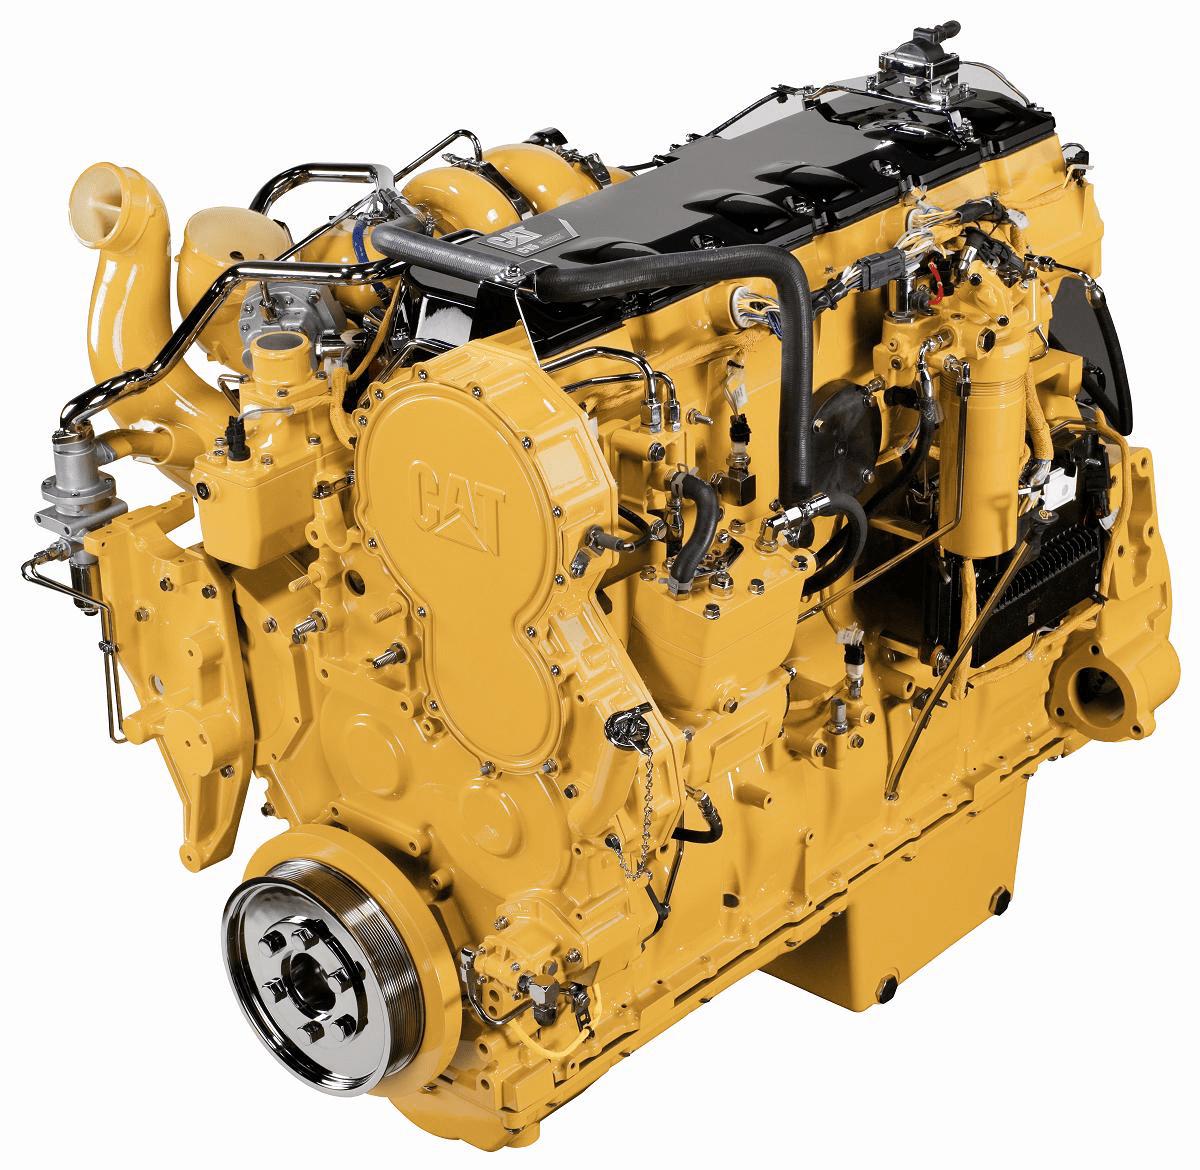 hight resolution of 3406b cat engine diagram